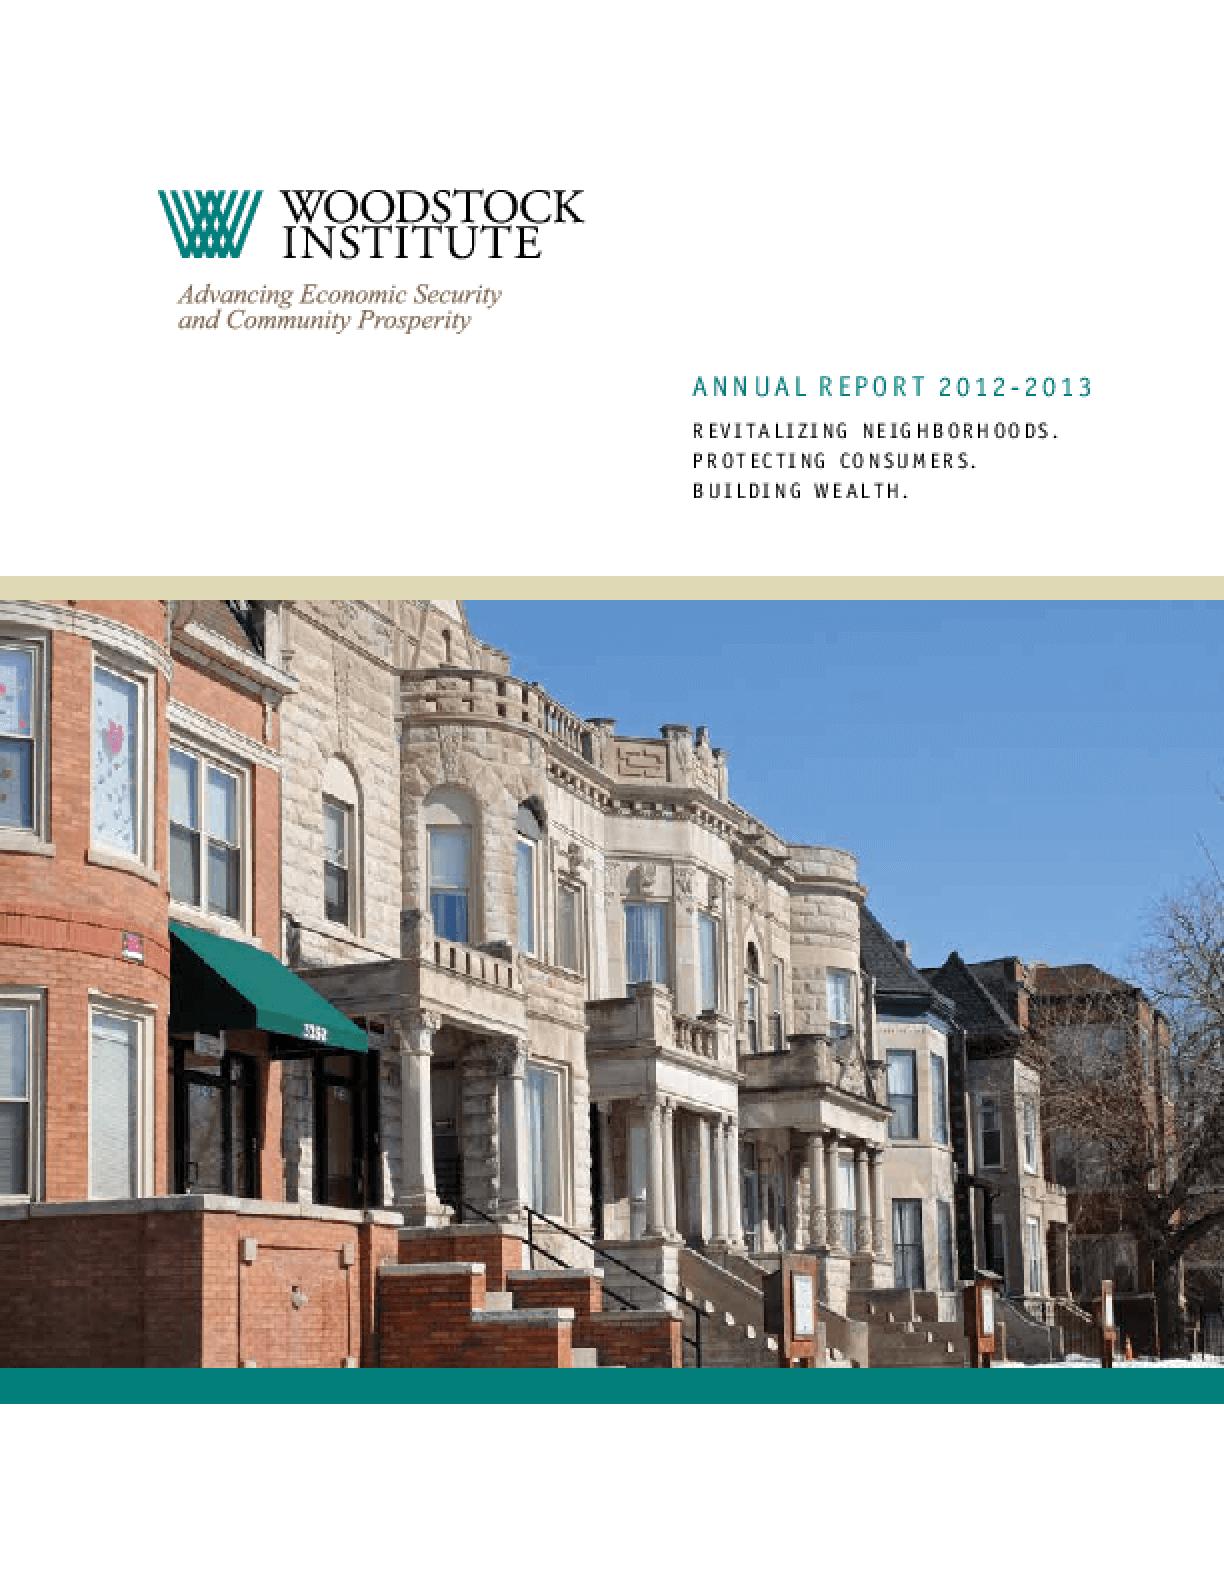 Woodstock Institute 2012-2013 Annual Report: Revitalizing Neighborhoods, Protecting Consumers, Building Wealth